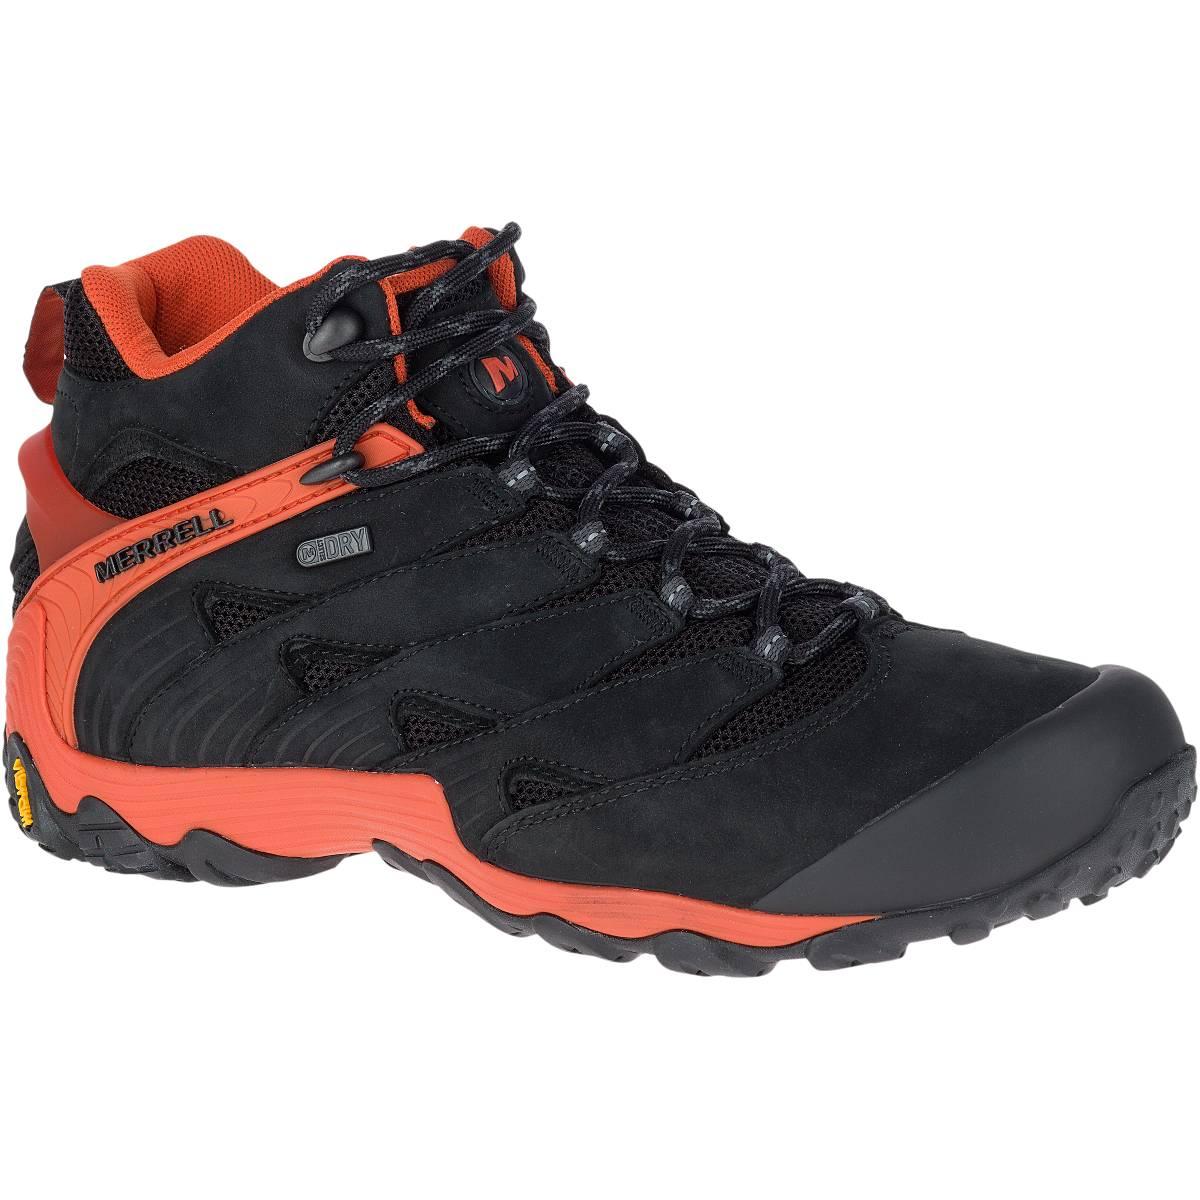 Chaussures Merrell Chameleon homme qOkyea6h2a